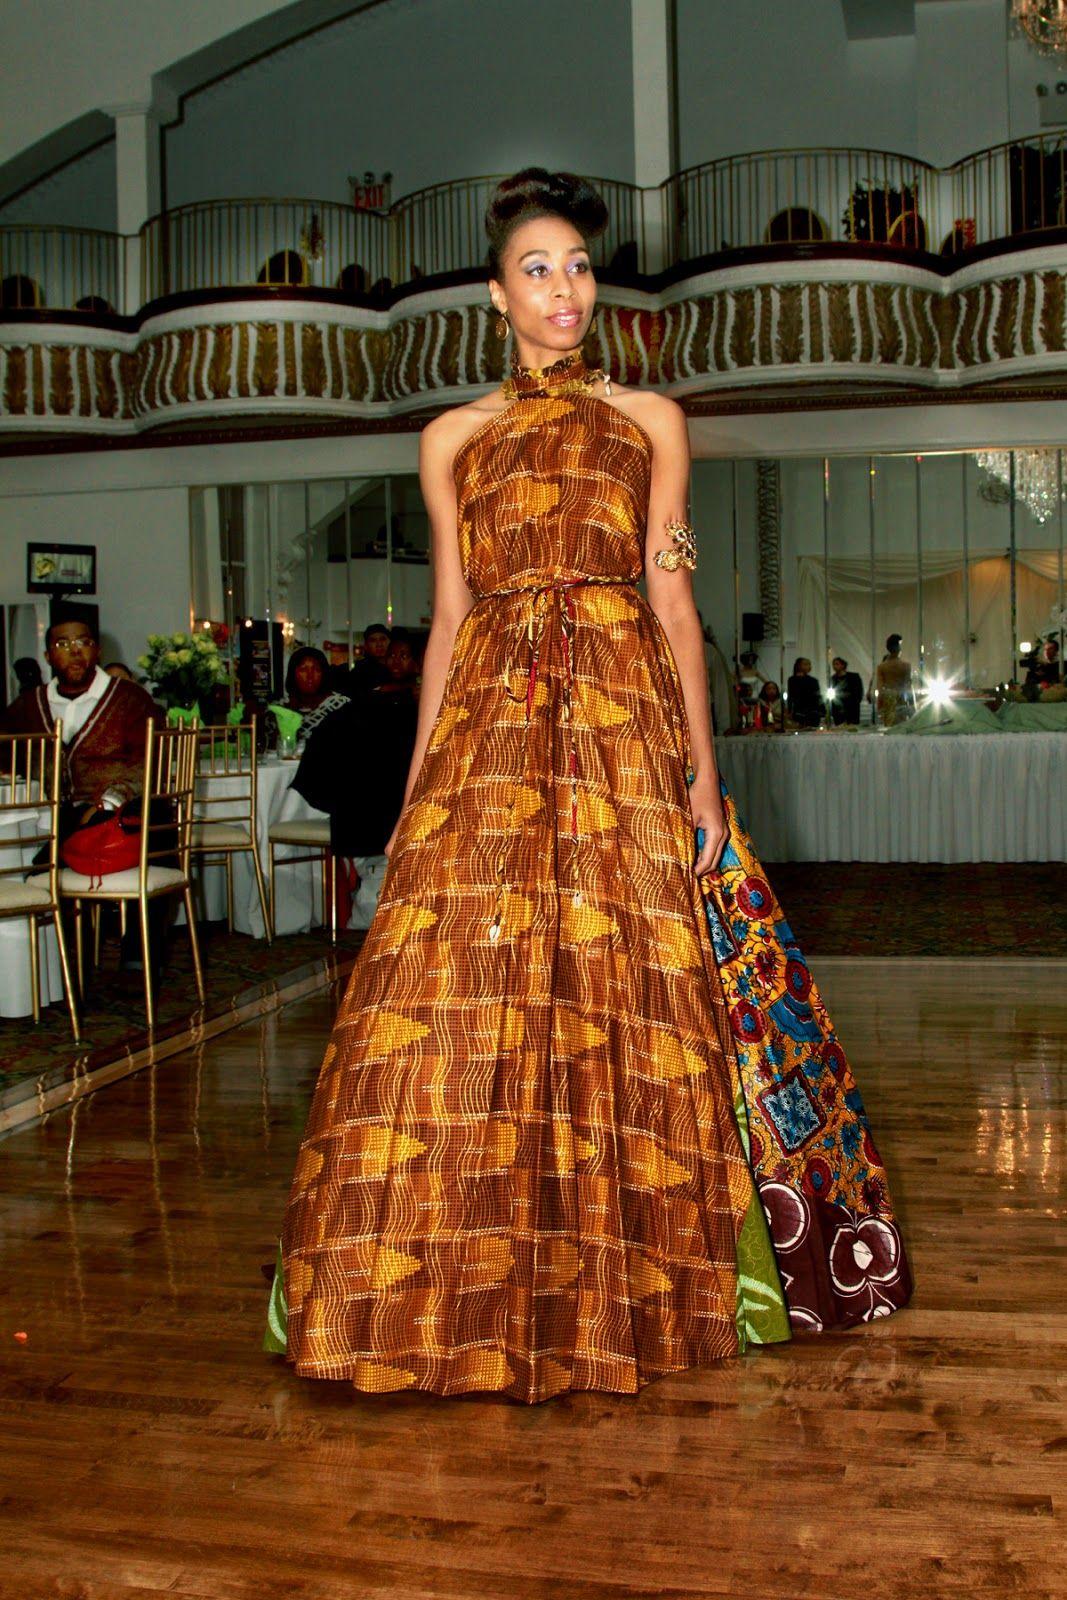 African Bridesmaids Dresses 2014 Designs Trend | beautiful dresses ...